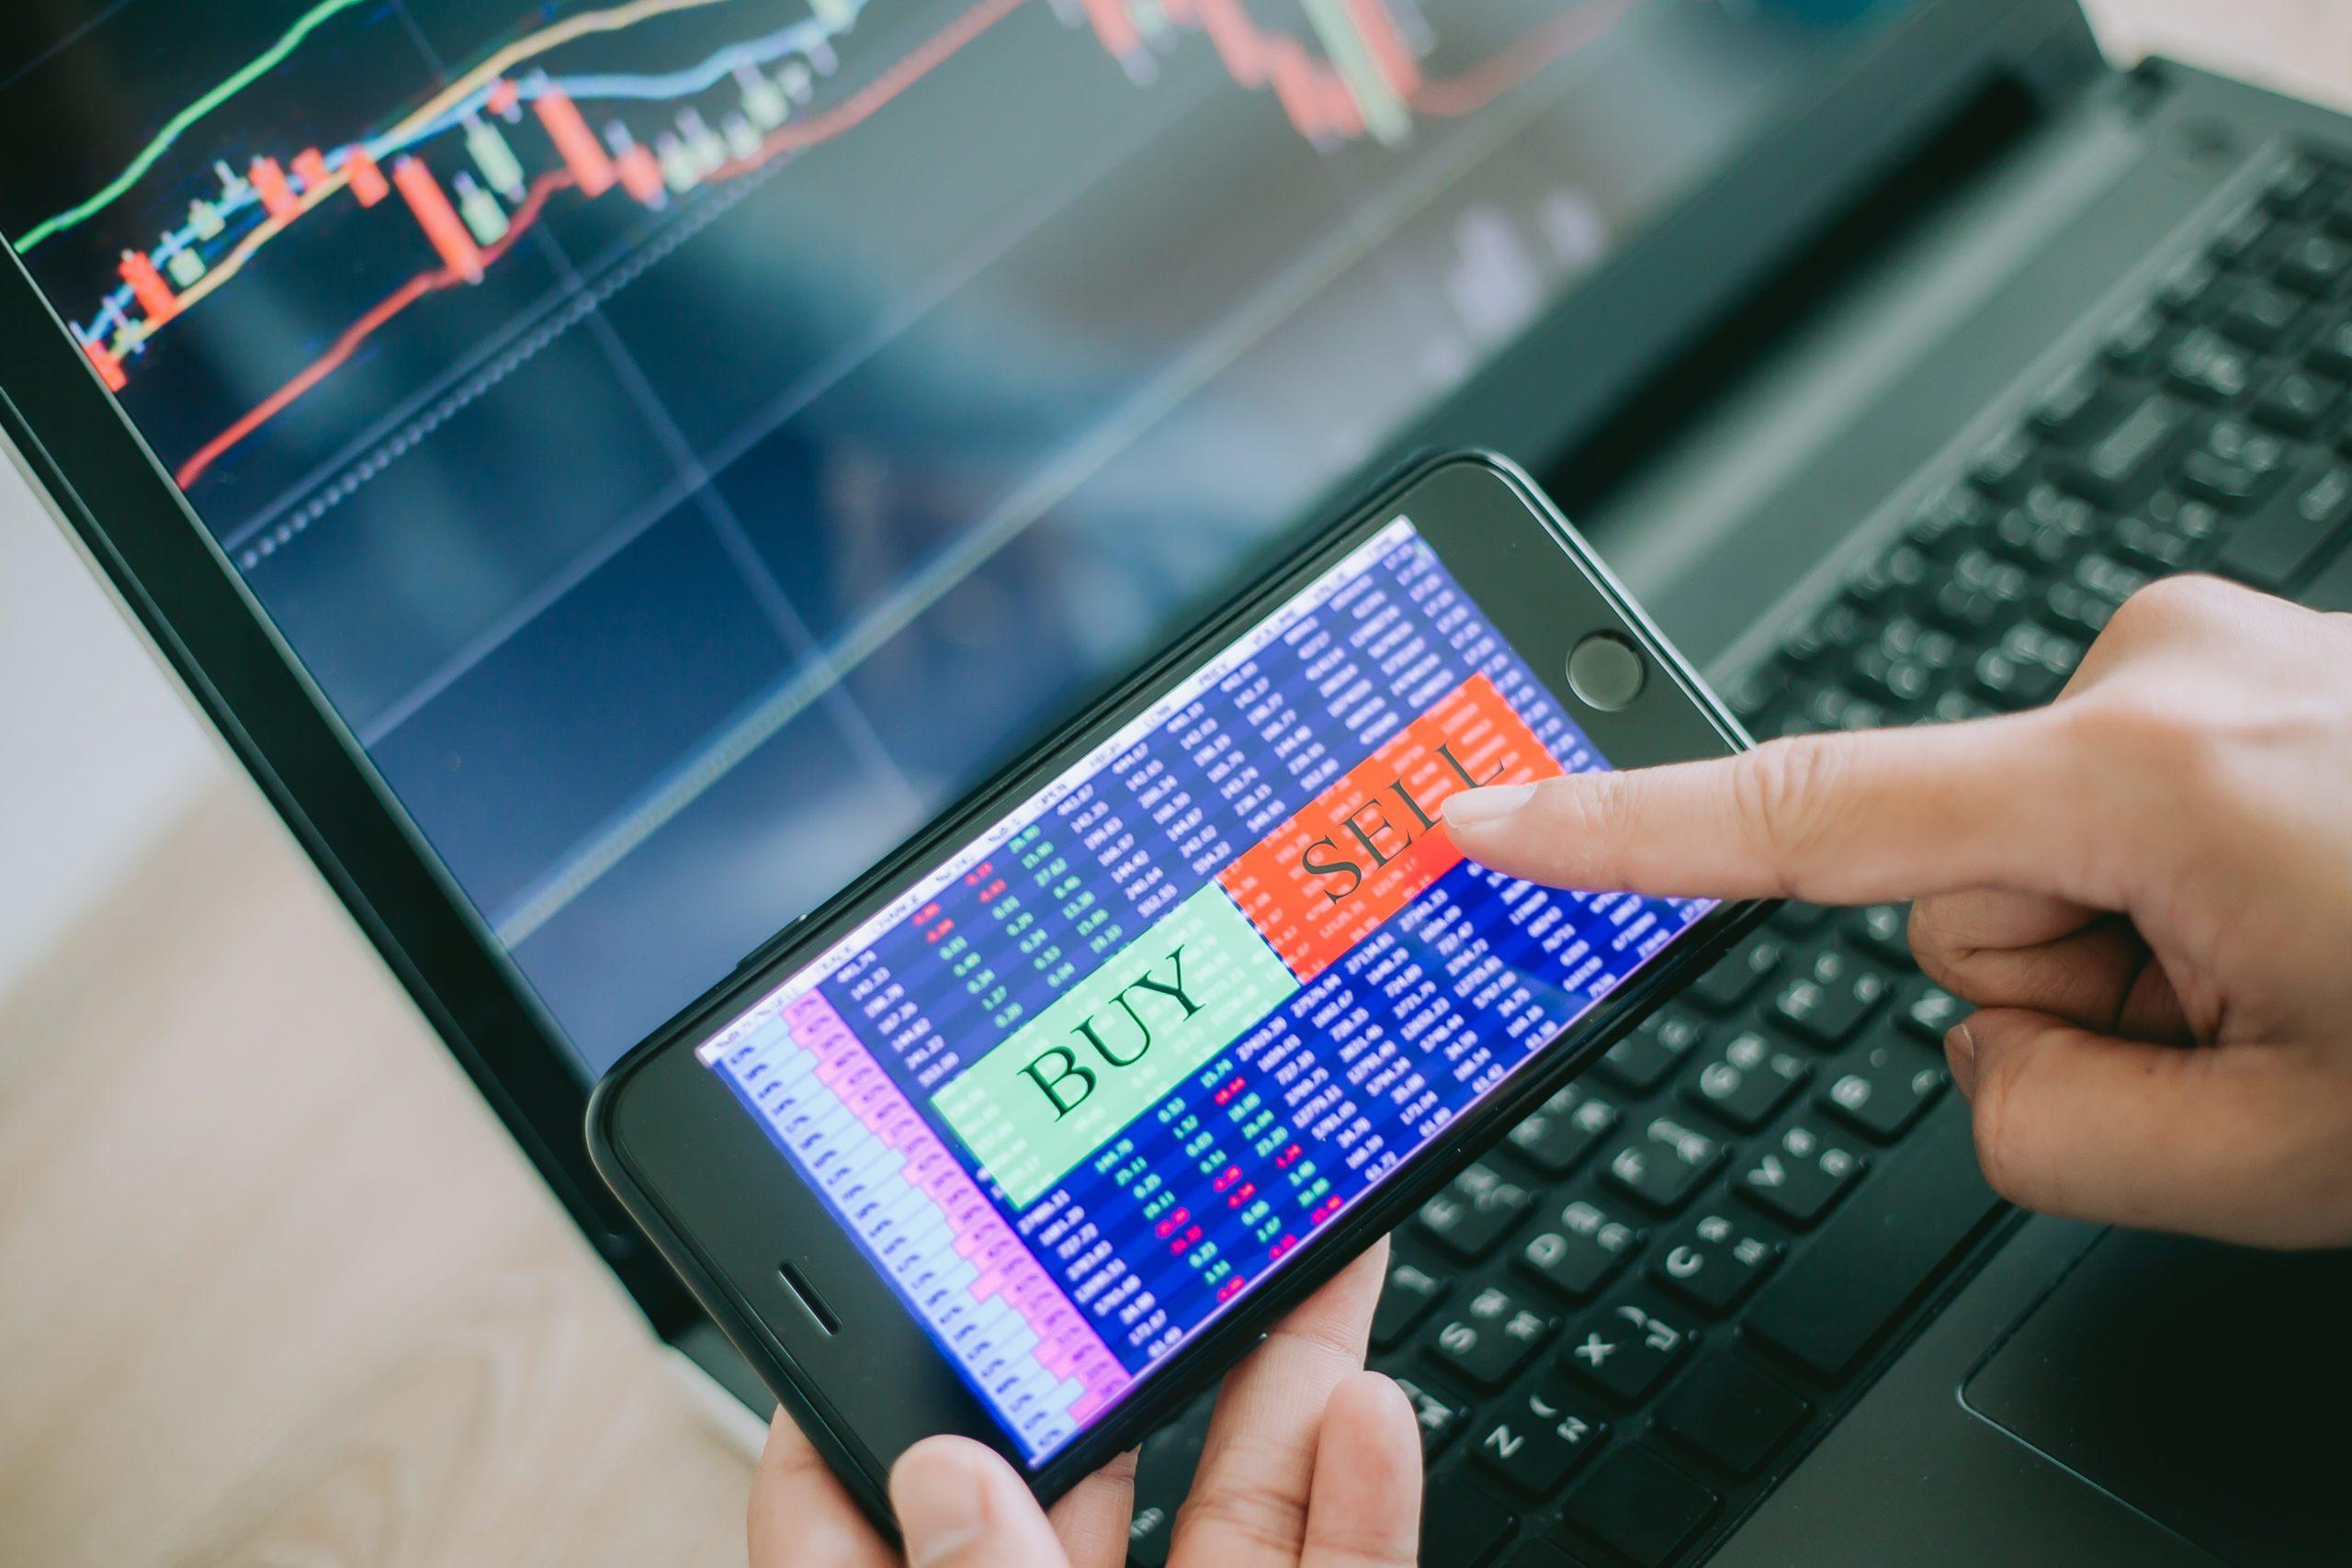 Trading-Signale vs. selbständiges Trading: Die perfekte Abkürzung?